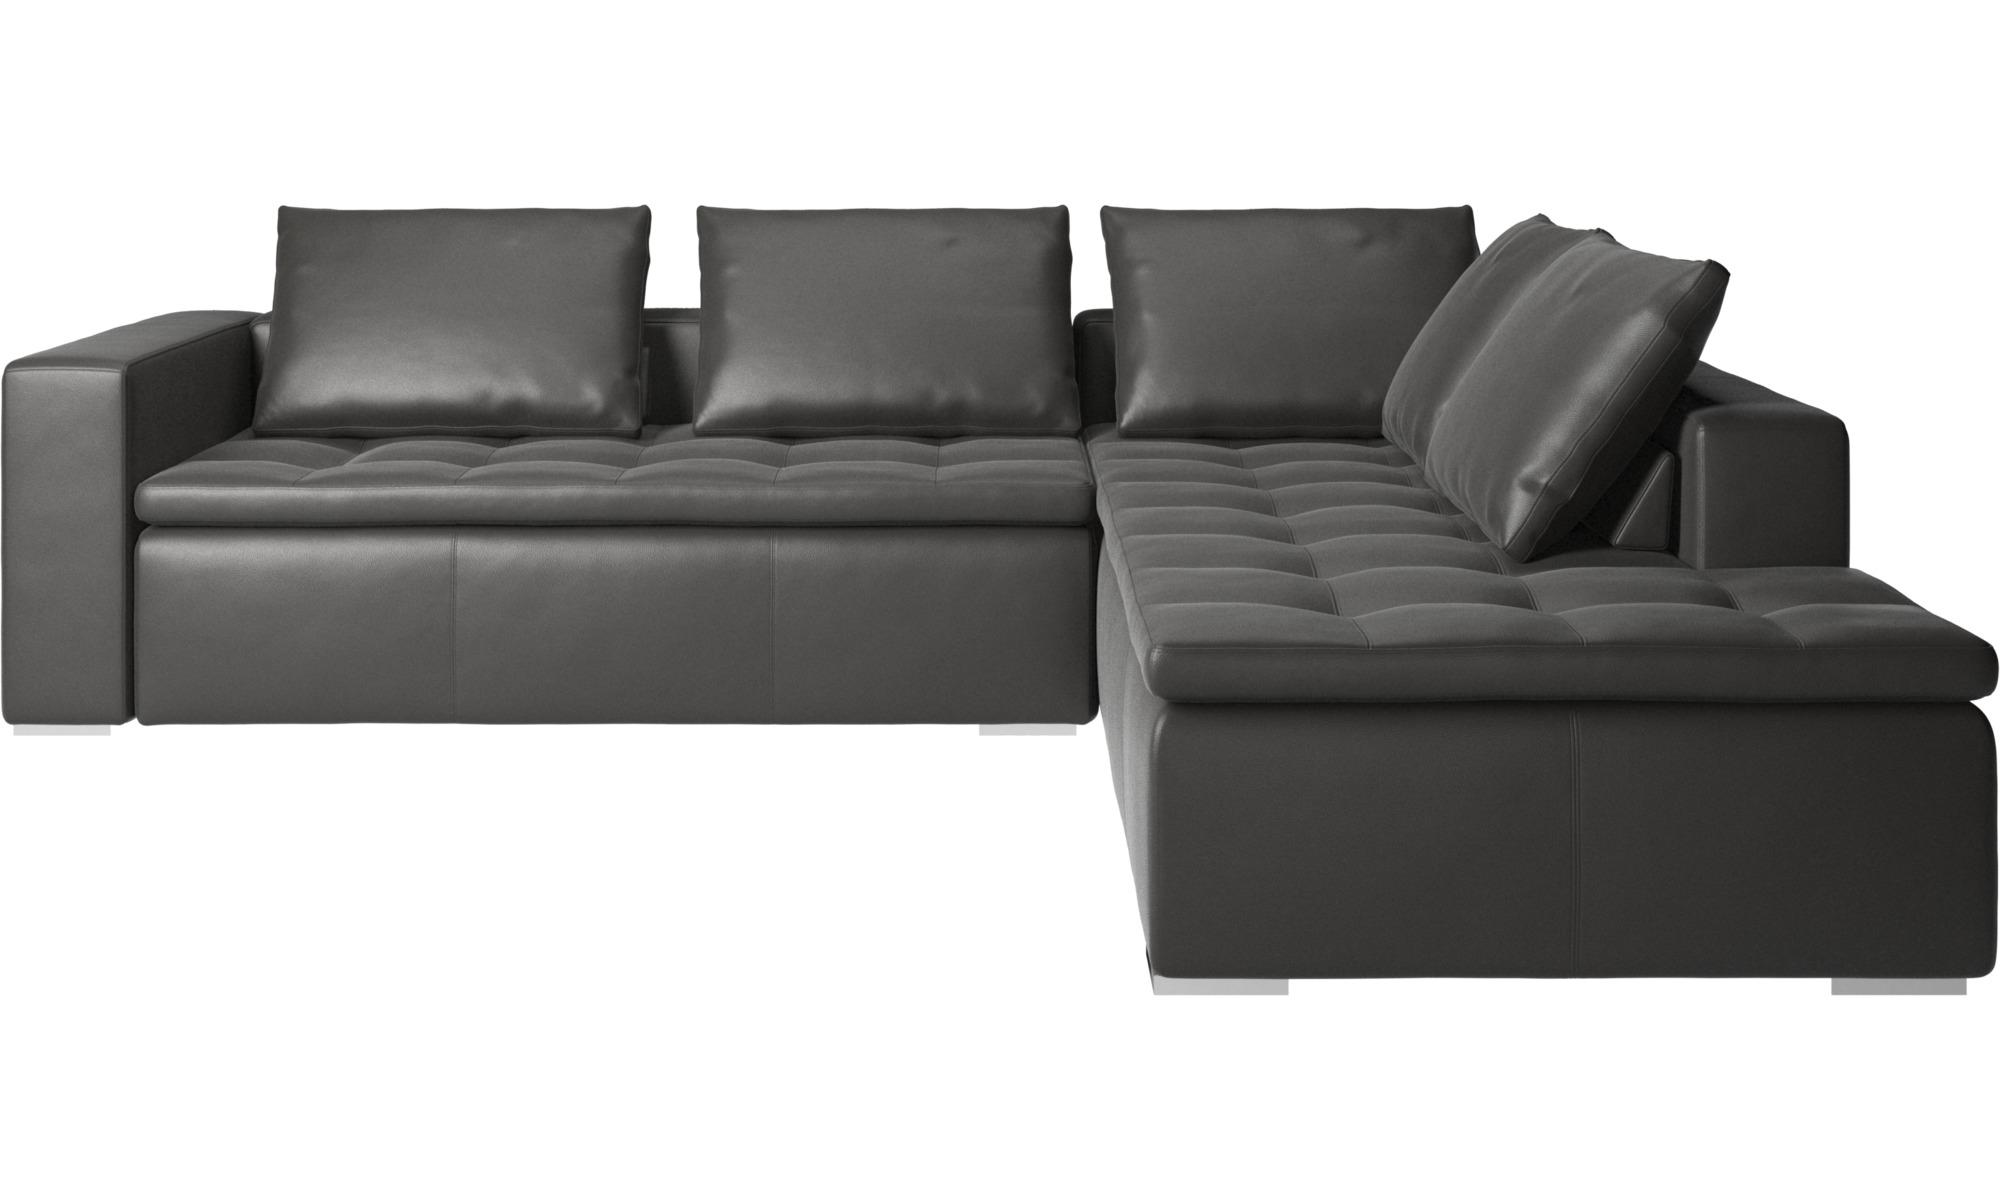 corner sofas mezzo corner sofa with lounging unit. Black Bedroom Furniture Sets. Home Design Ideas